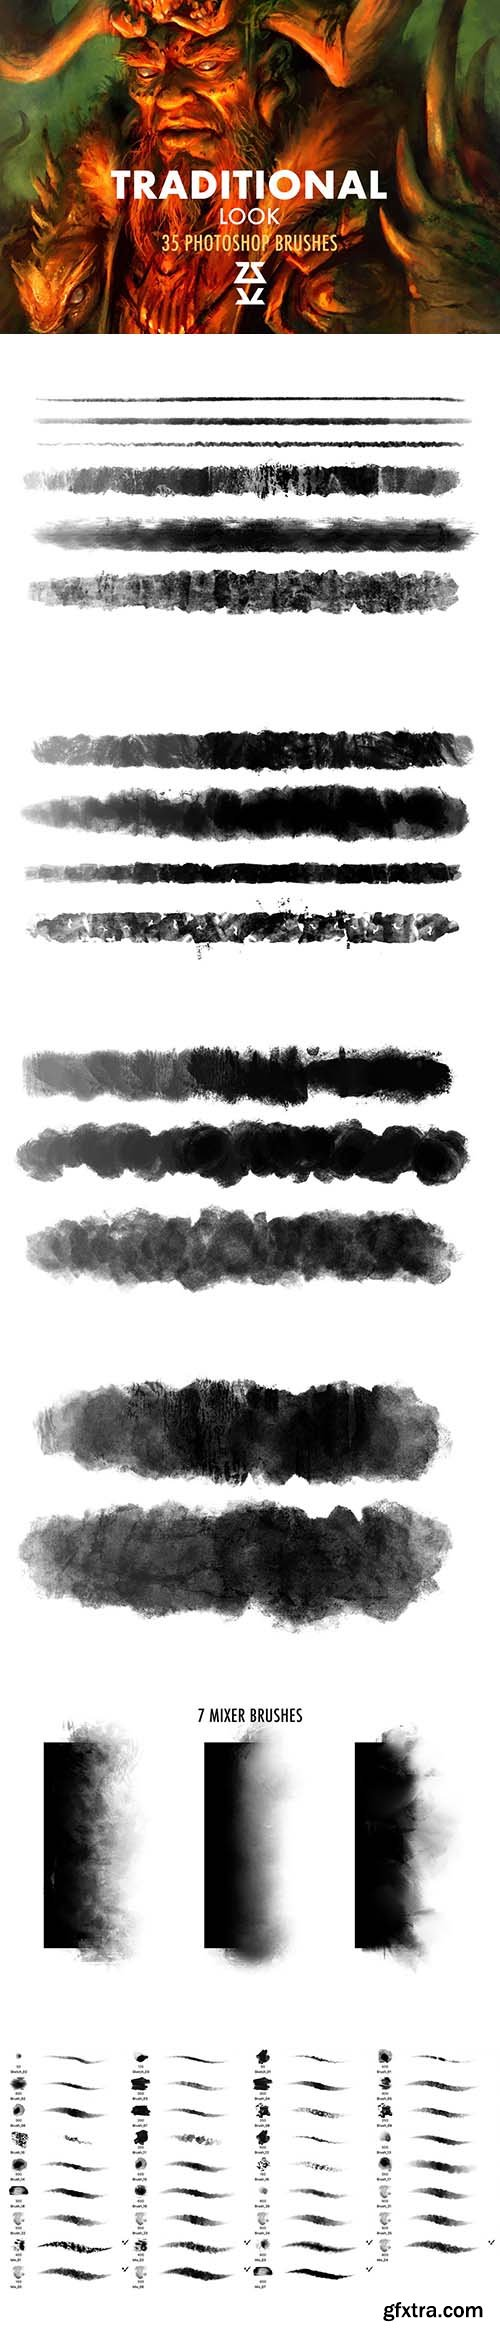 CreativeMarket - Traditional Look Brush Set 5907463